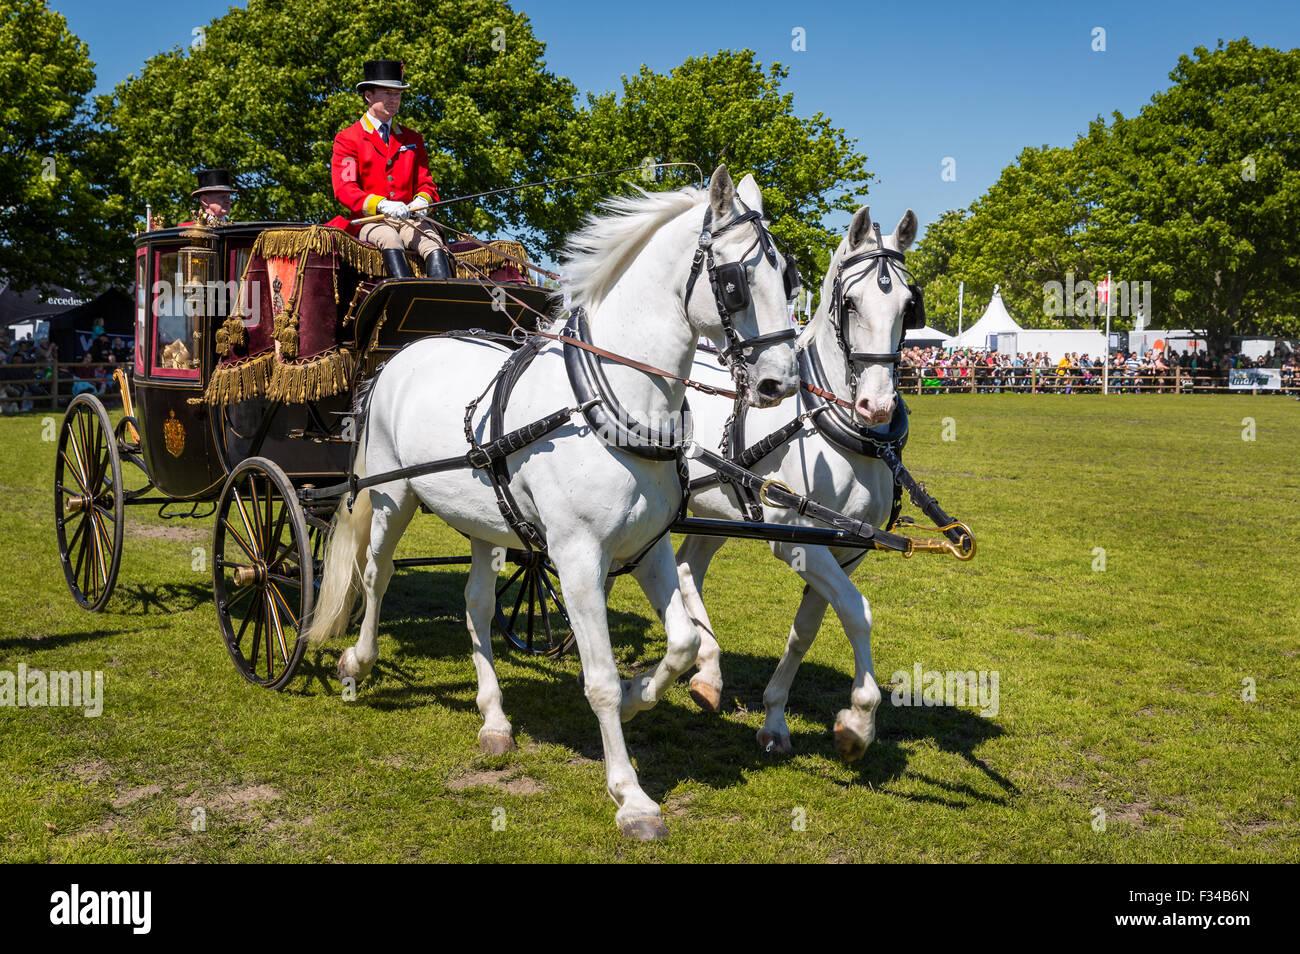 The Royal Coach, Roskilde Denmark - Stock Image